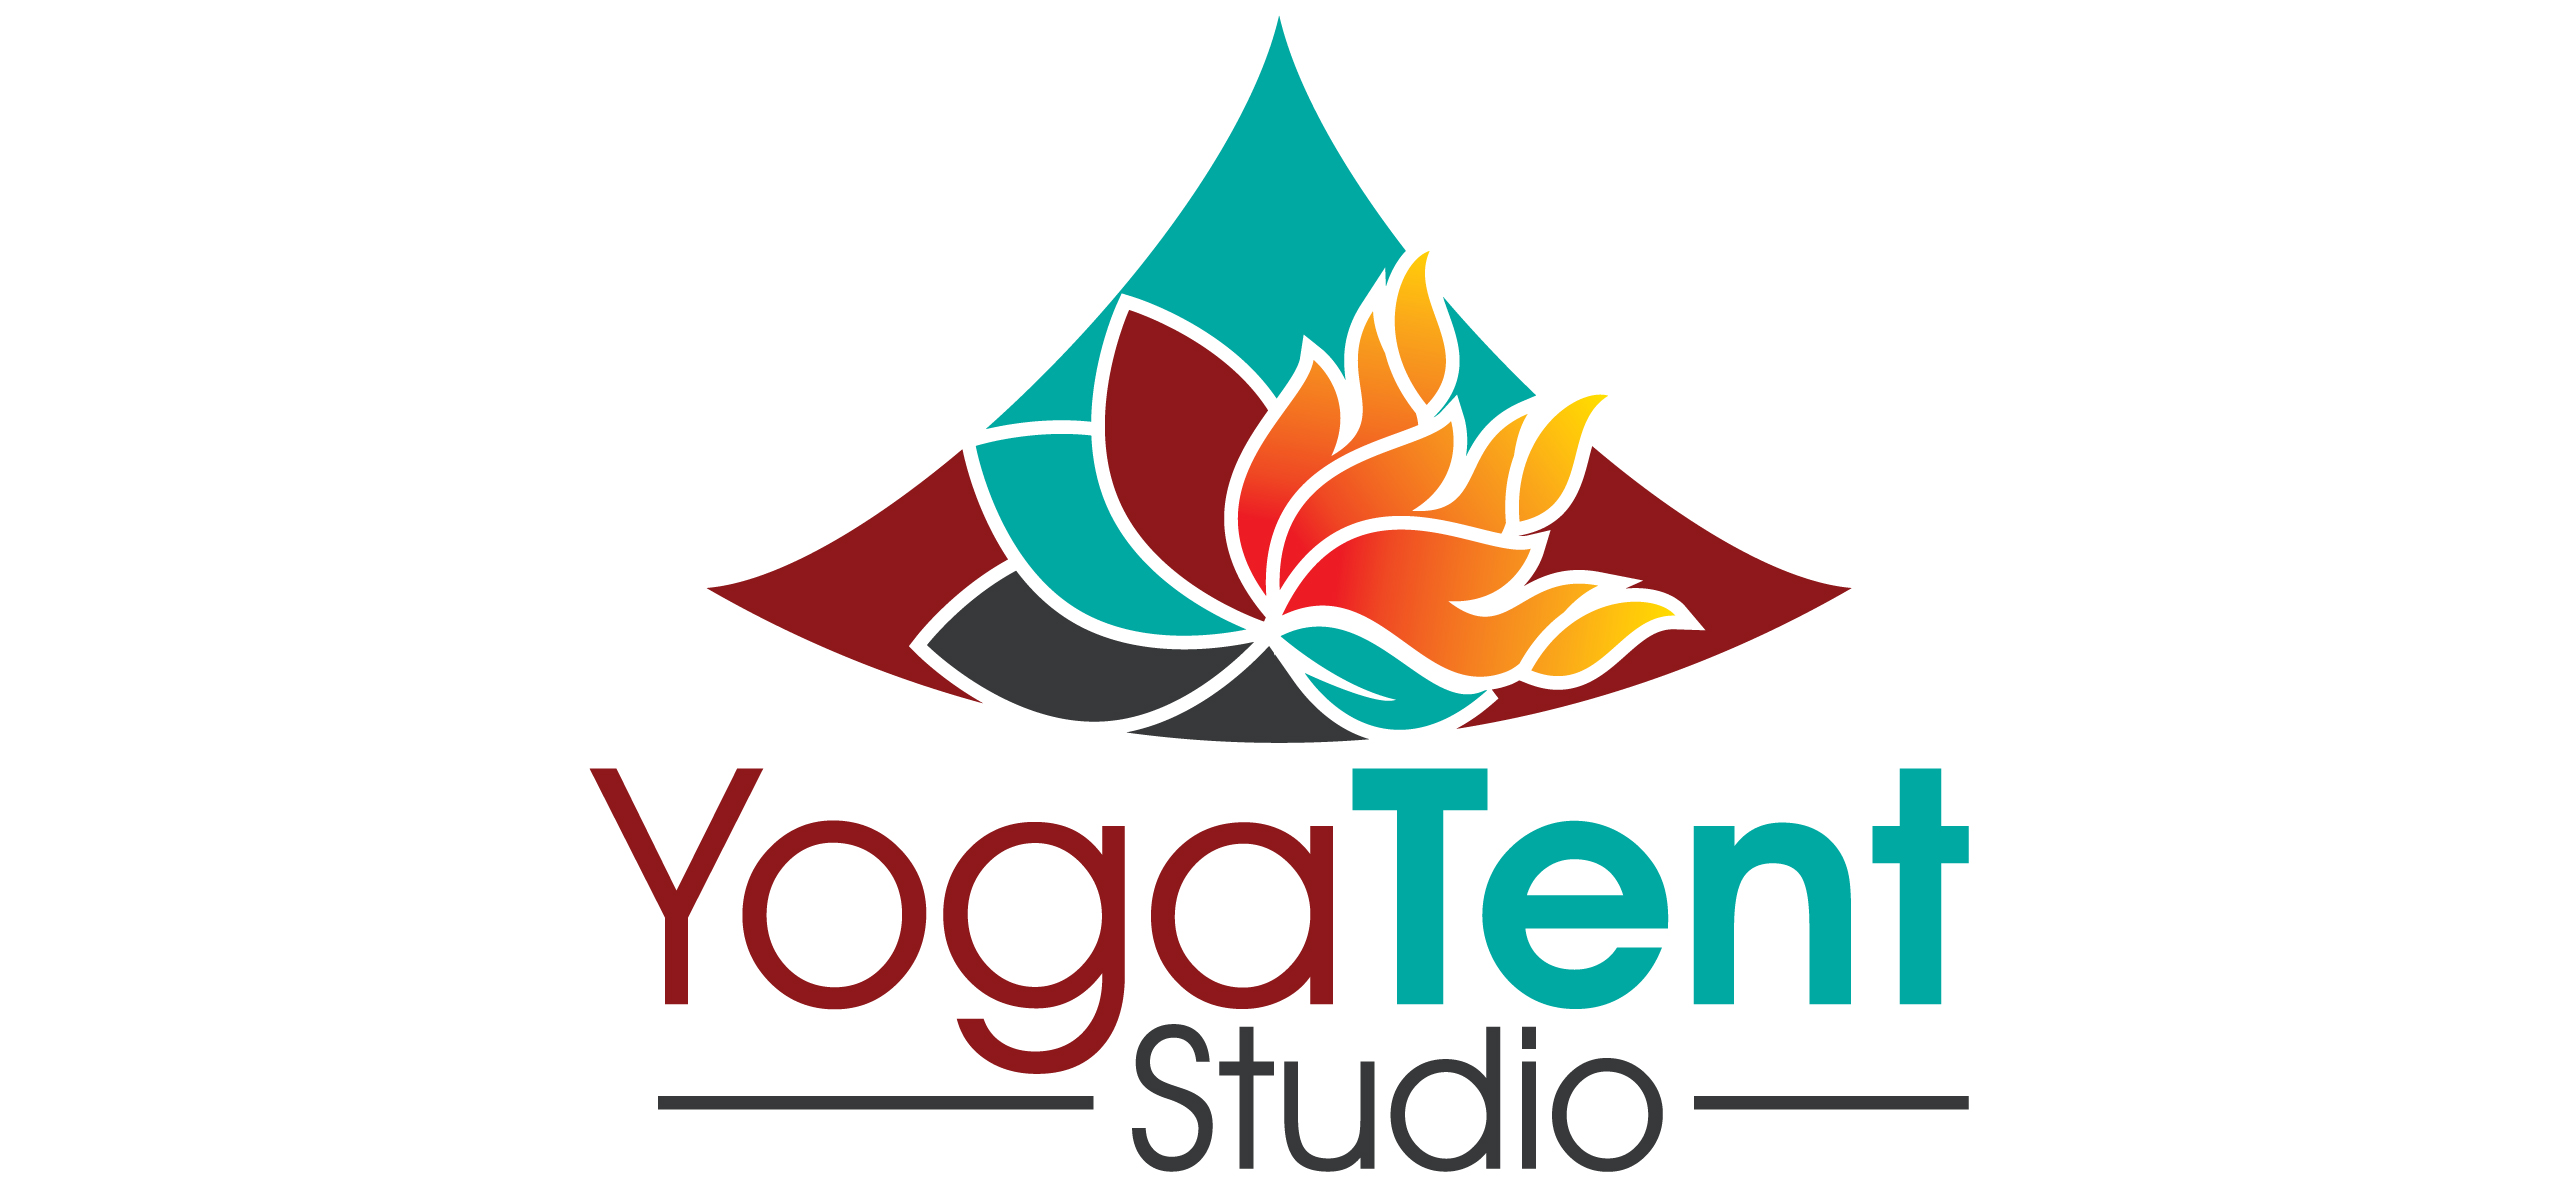 YogaTent Studio